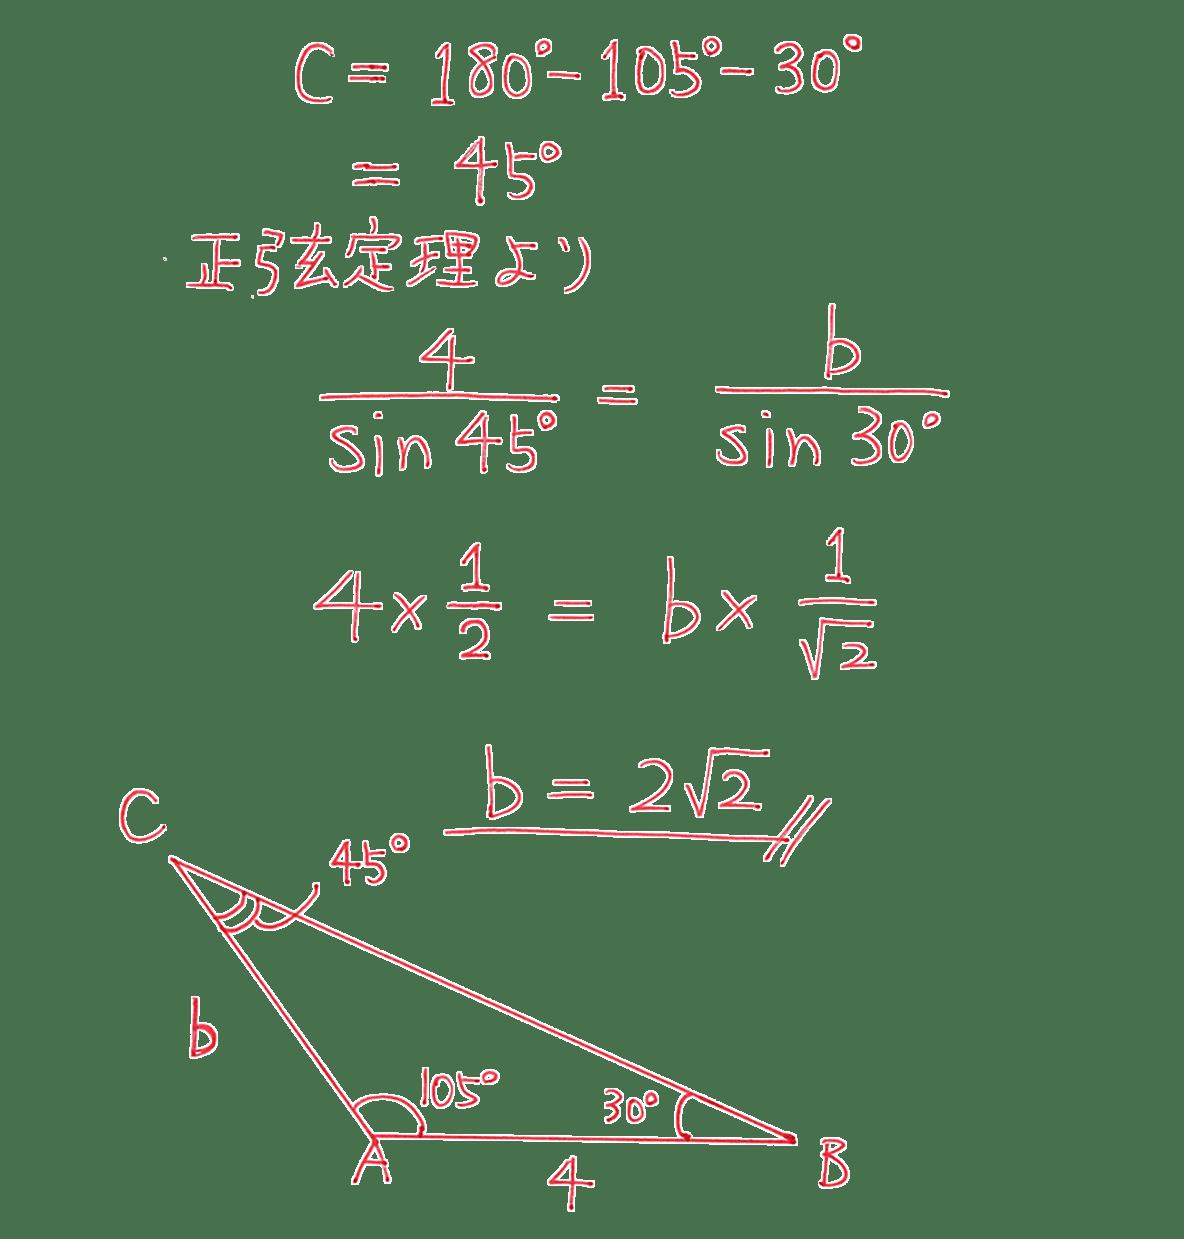 高校数学Ⅰ 三角比20 練習の答え